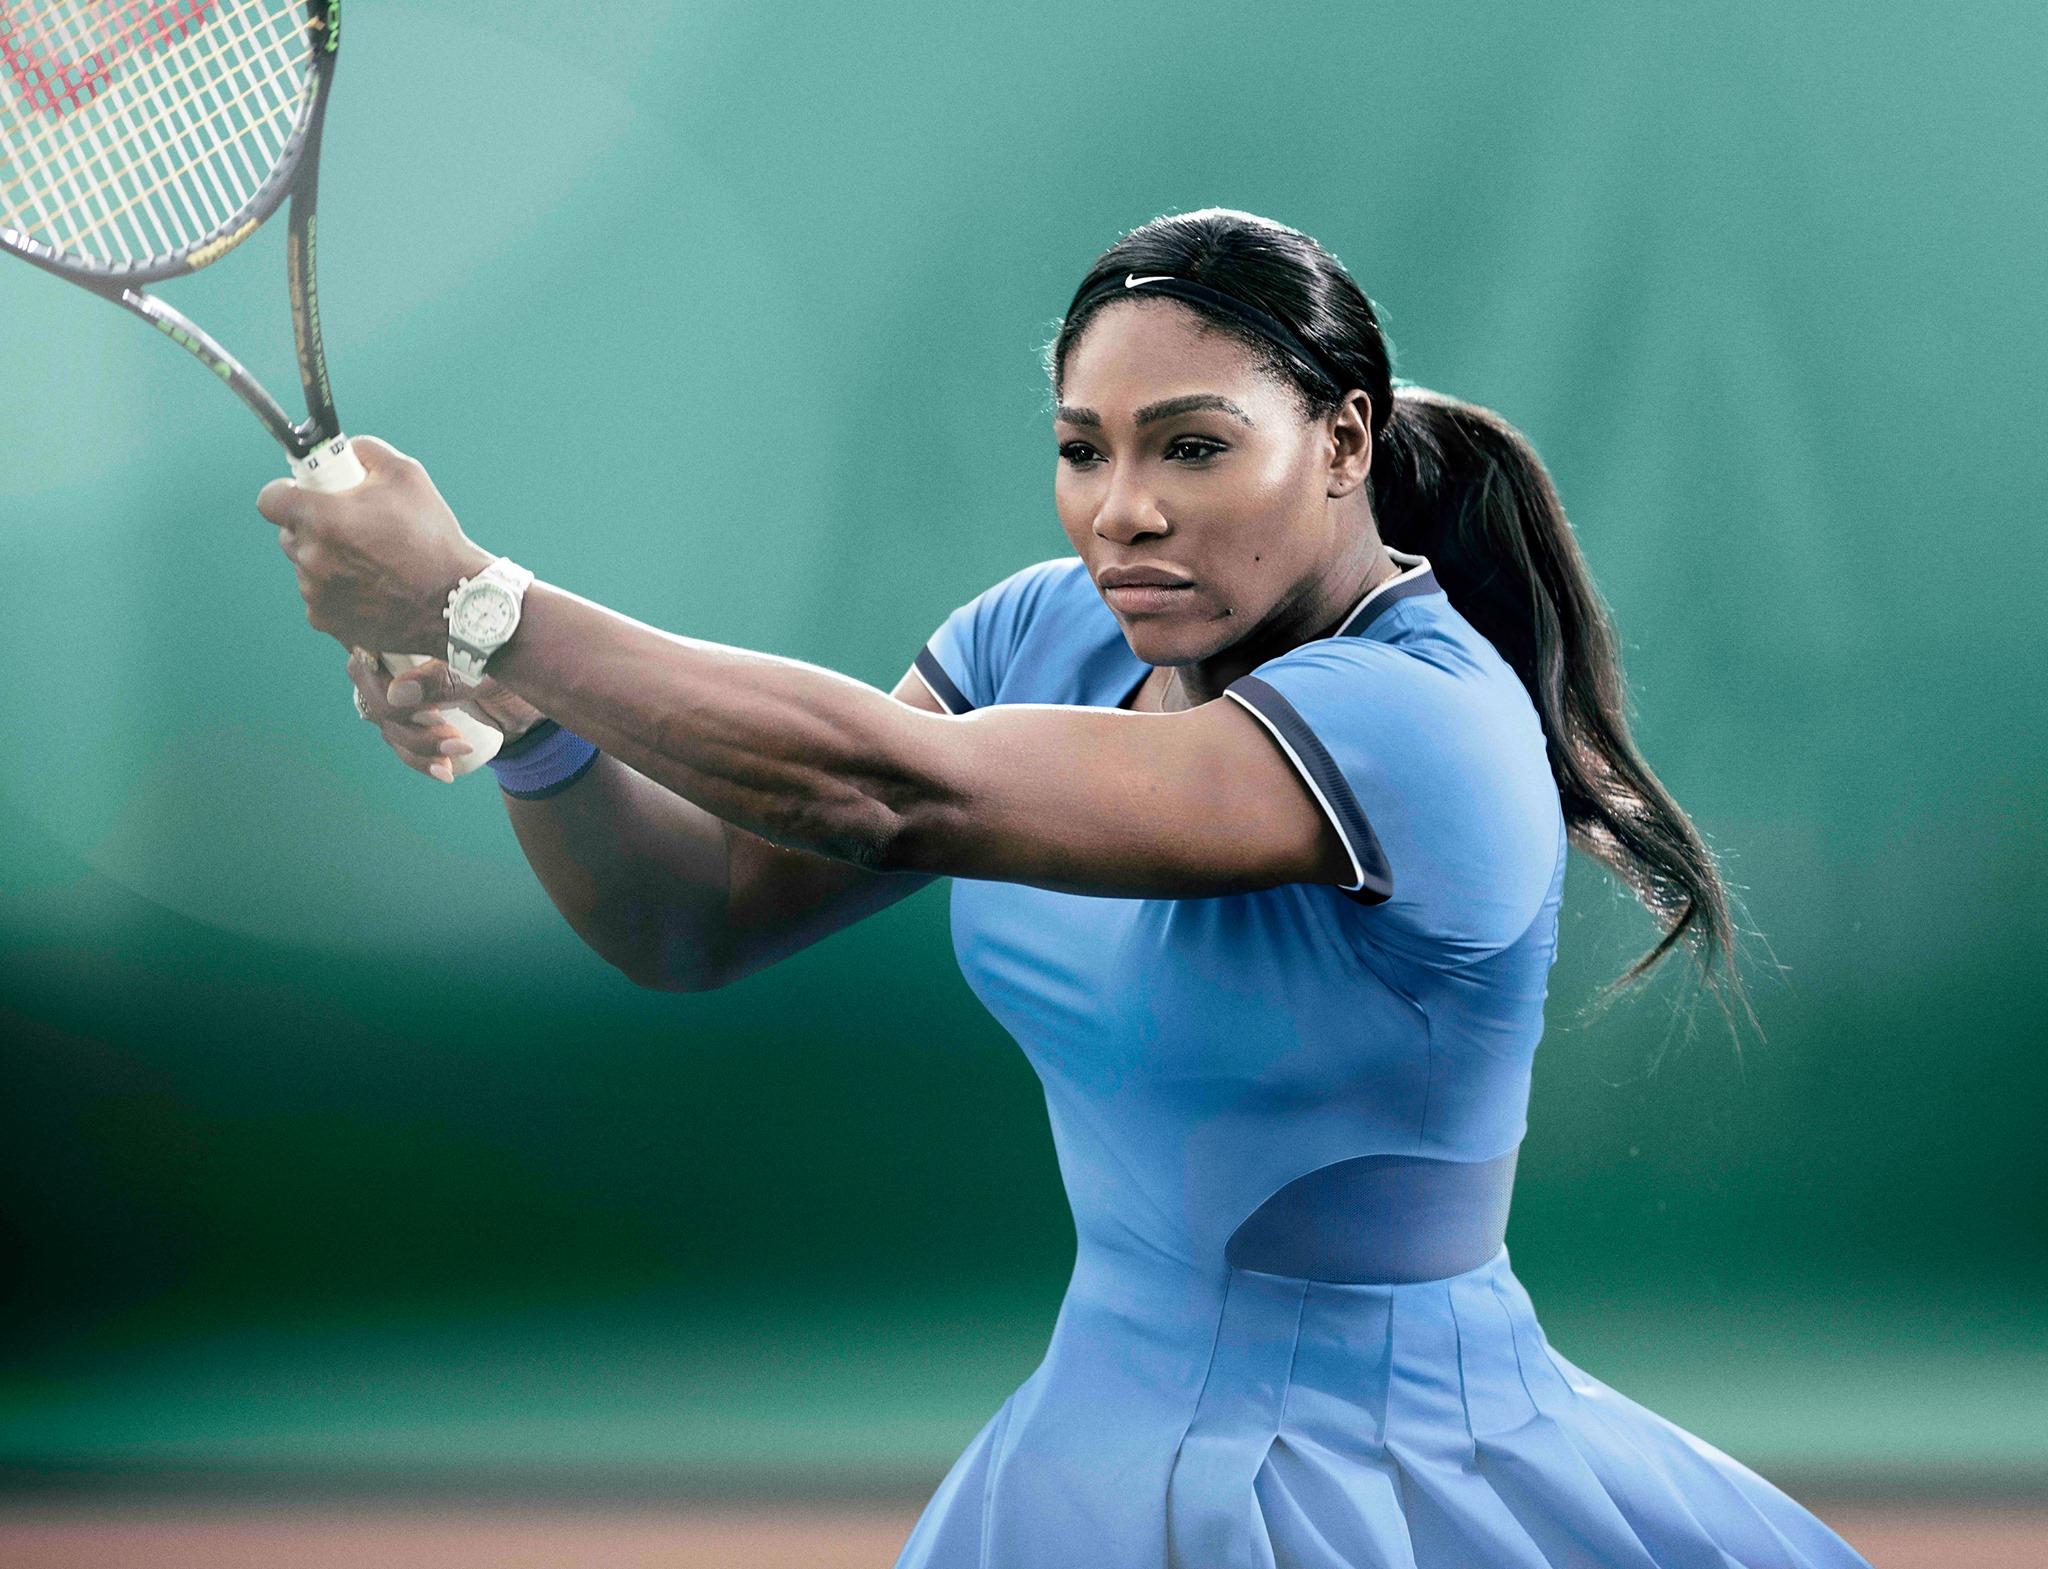 На грани между спортом и модой: Серена Уильямс и Nike решились на эксперимент